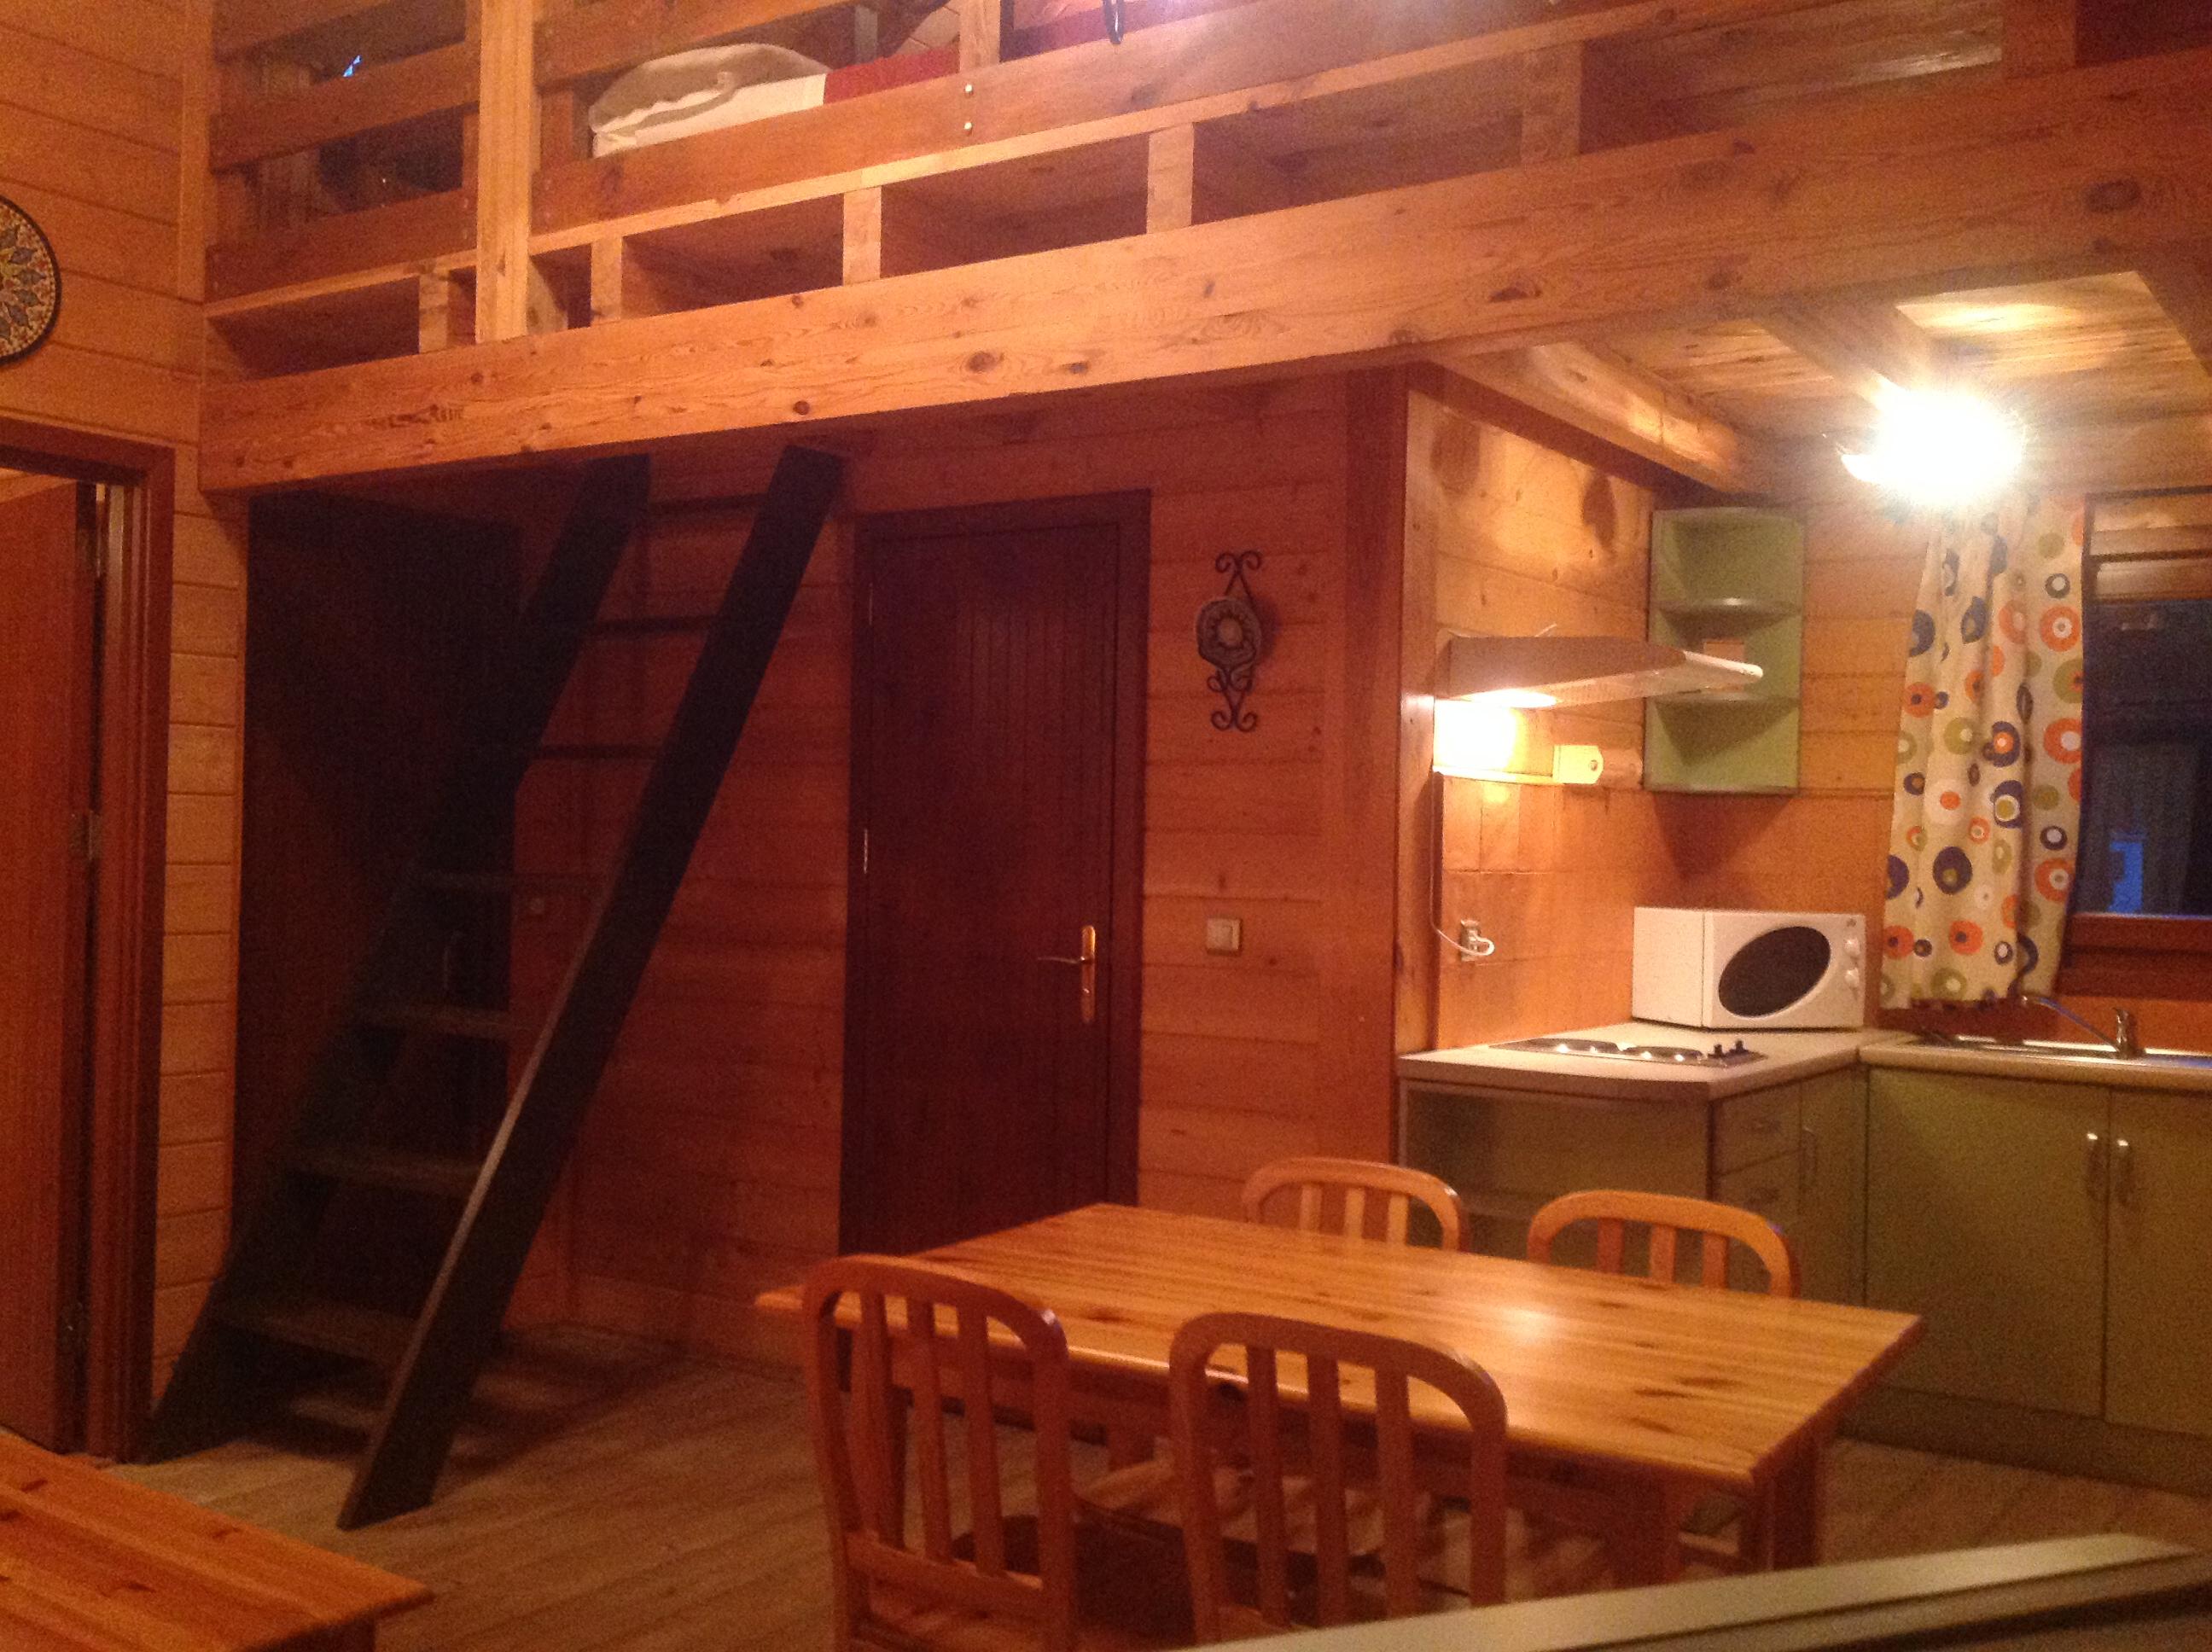 Caba as de madera el retiro de don quijote for Cocina inglesa de la cabana